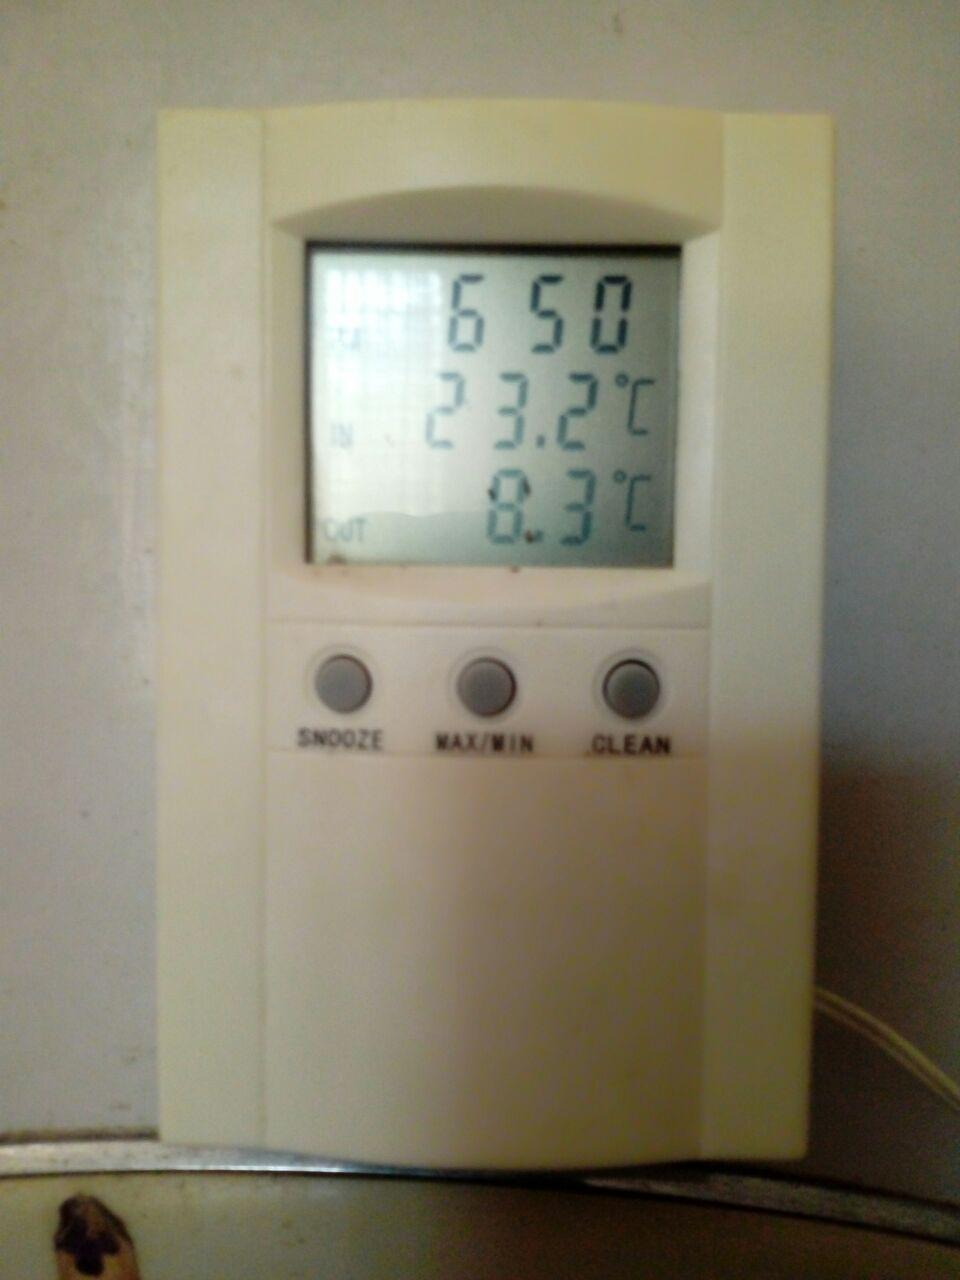 http://www.energialternativa.info/public/newforum/ForumEA/U/termometro-frigo.jpg